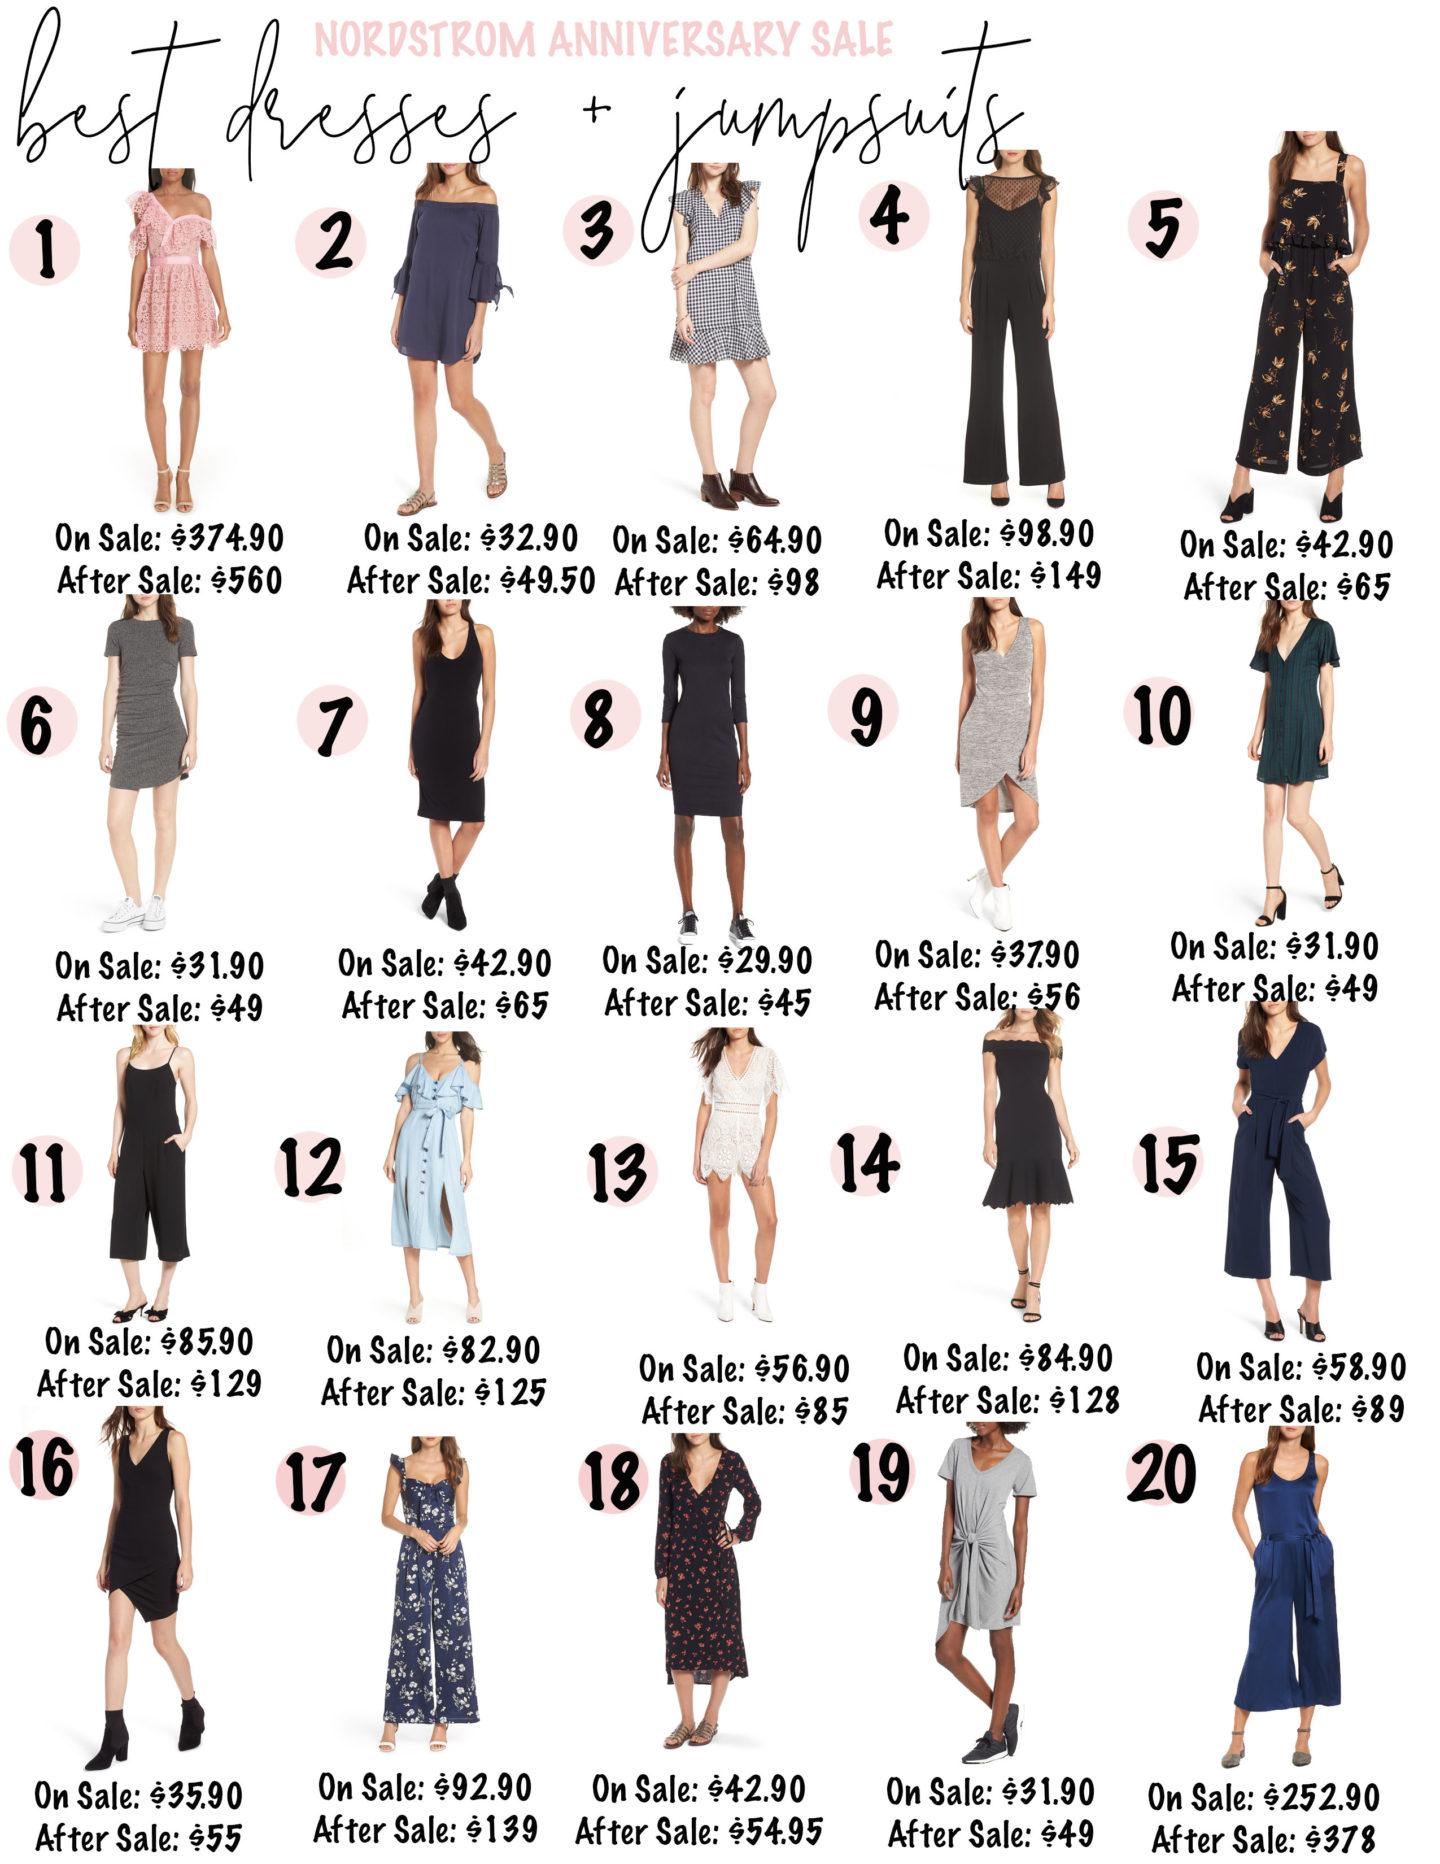 Nordstrom Anniversary Sale 2018 – Best Dresses + Jumpsuits